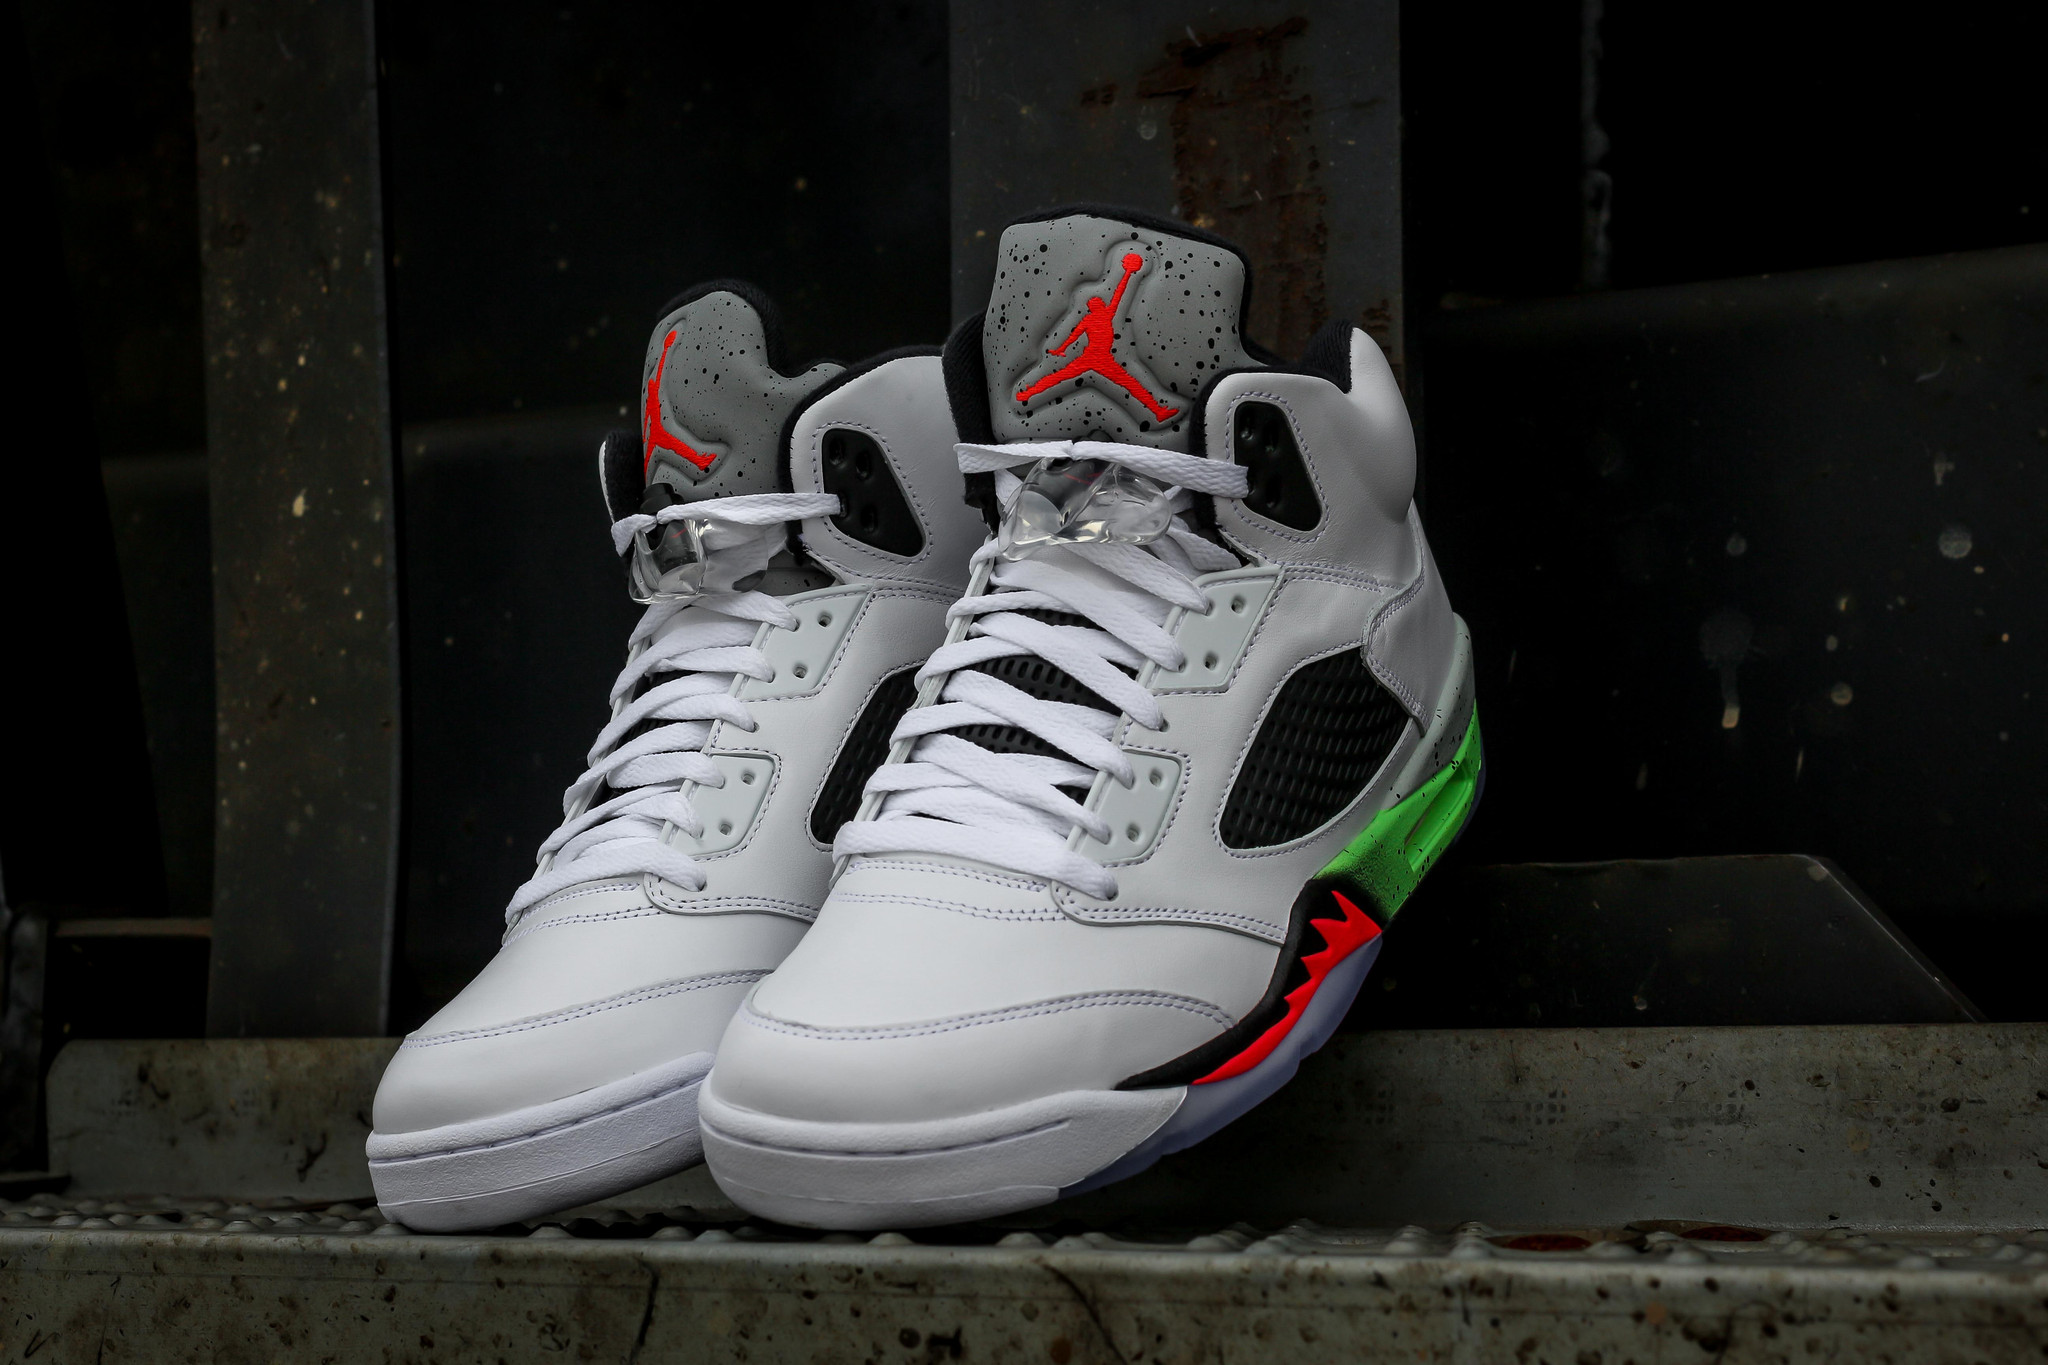 jordans 5s shoes for men nz